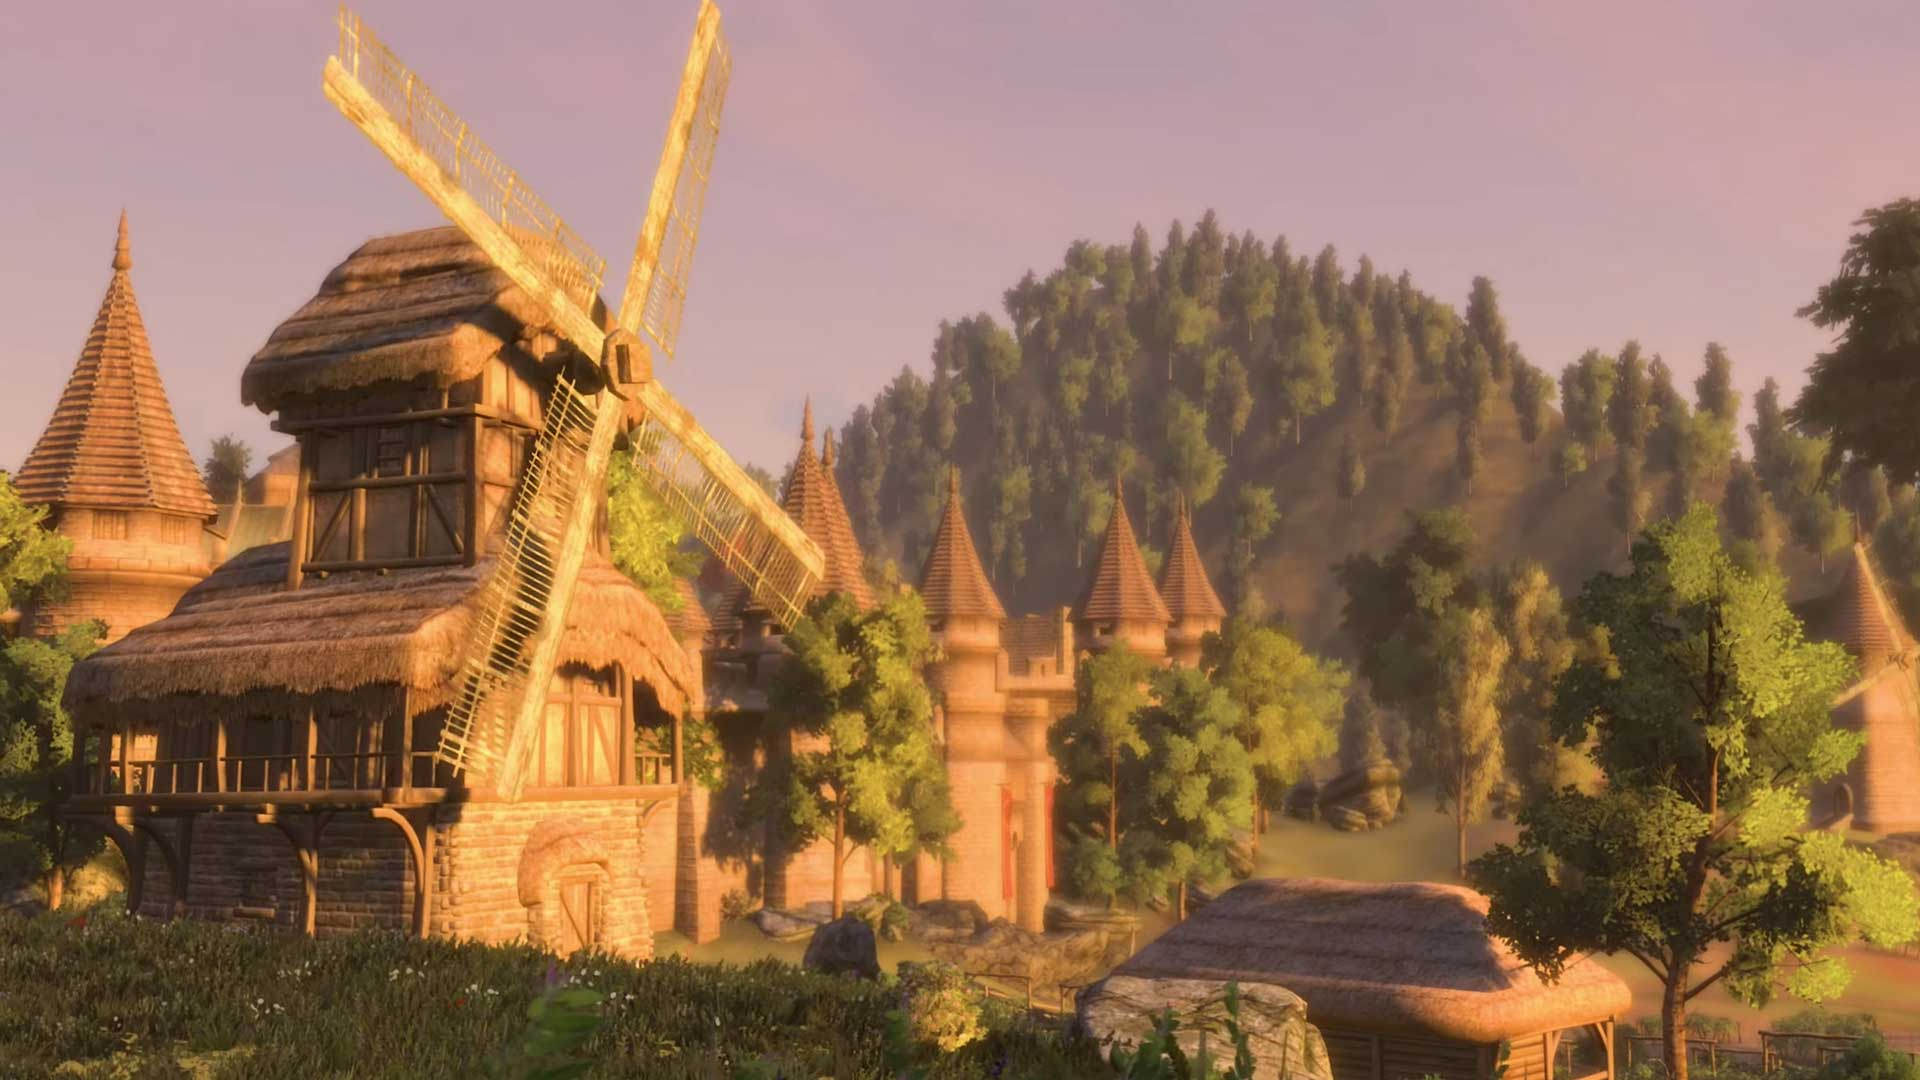 The Elder Scrolls IV: Skyblivion